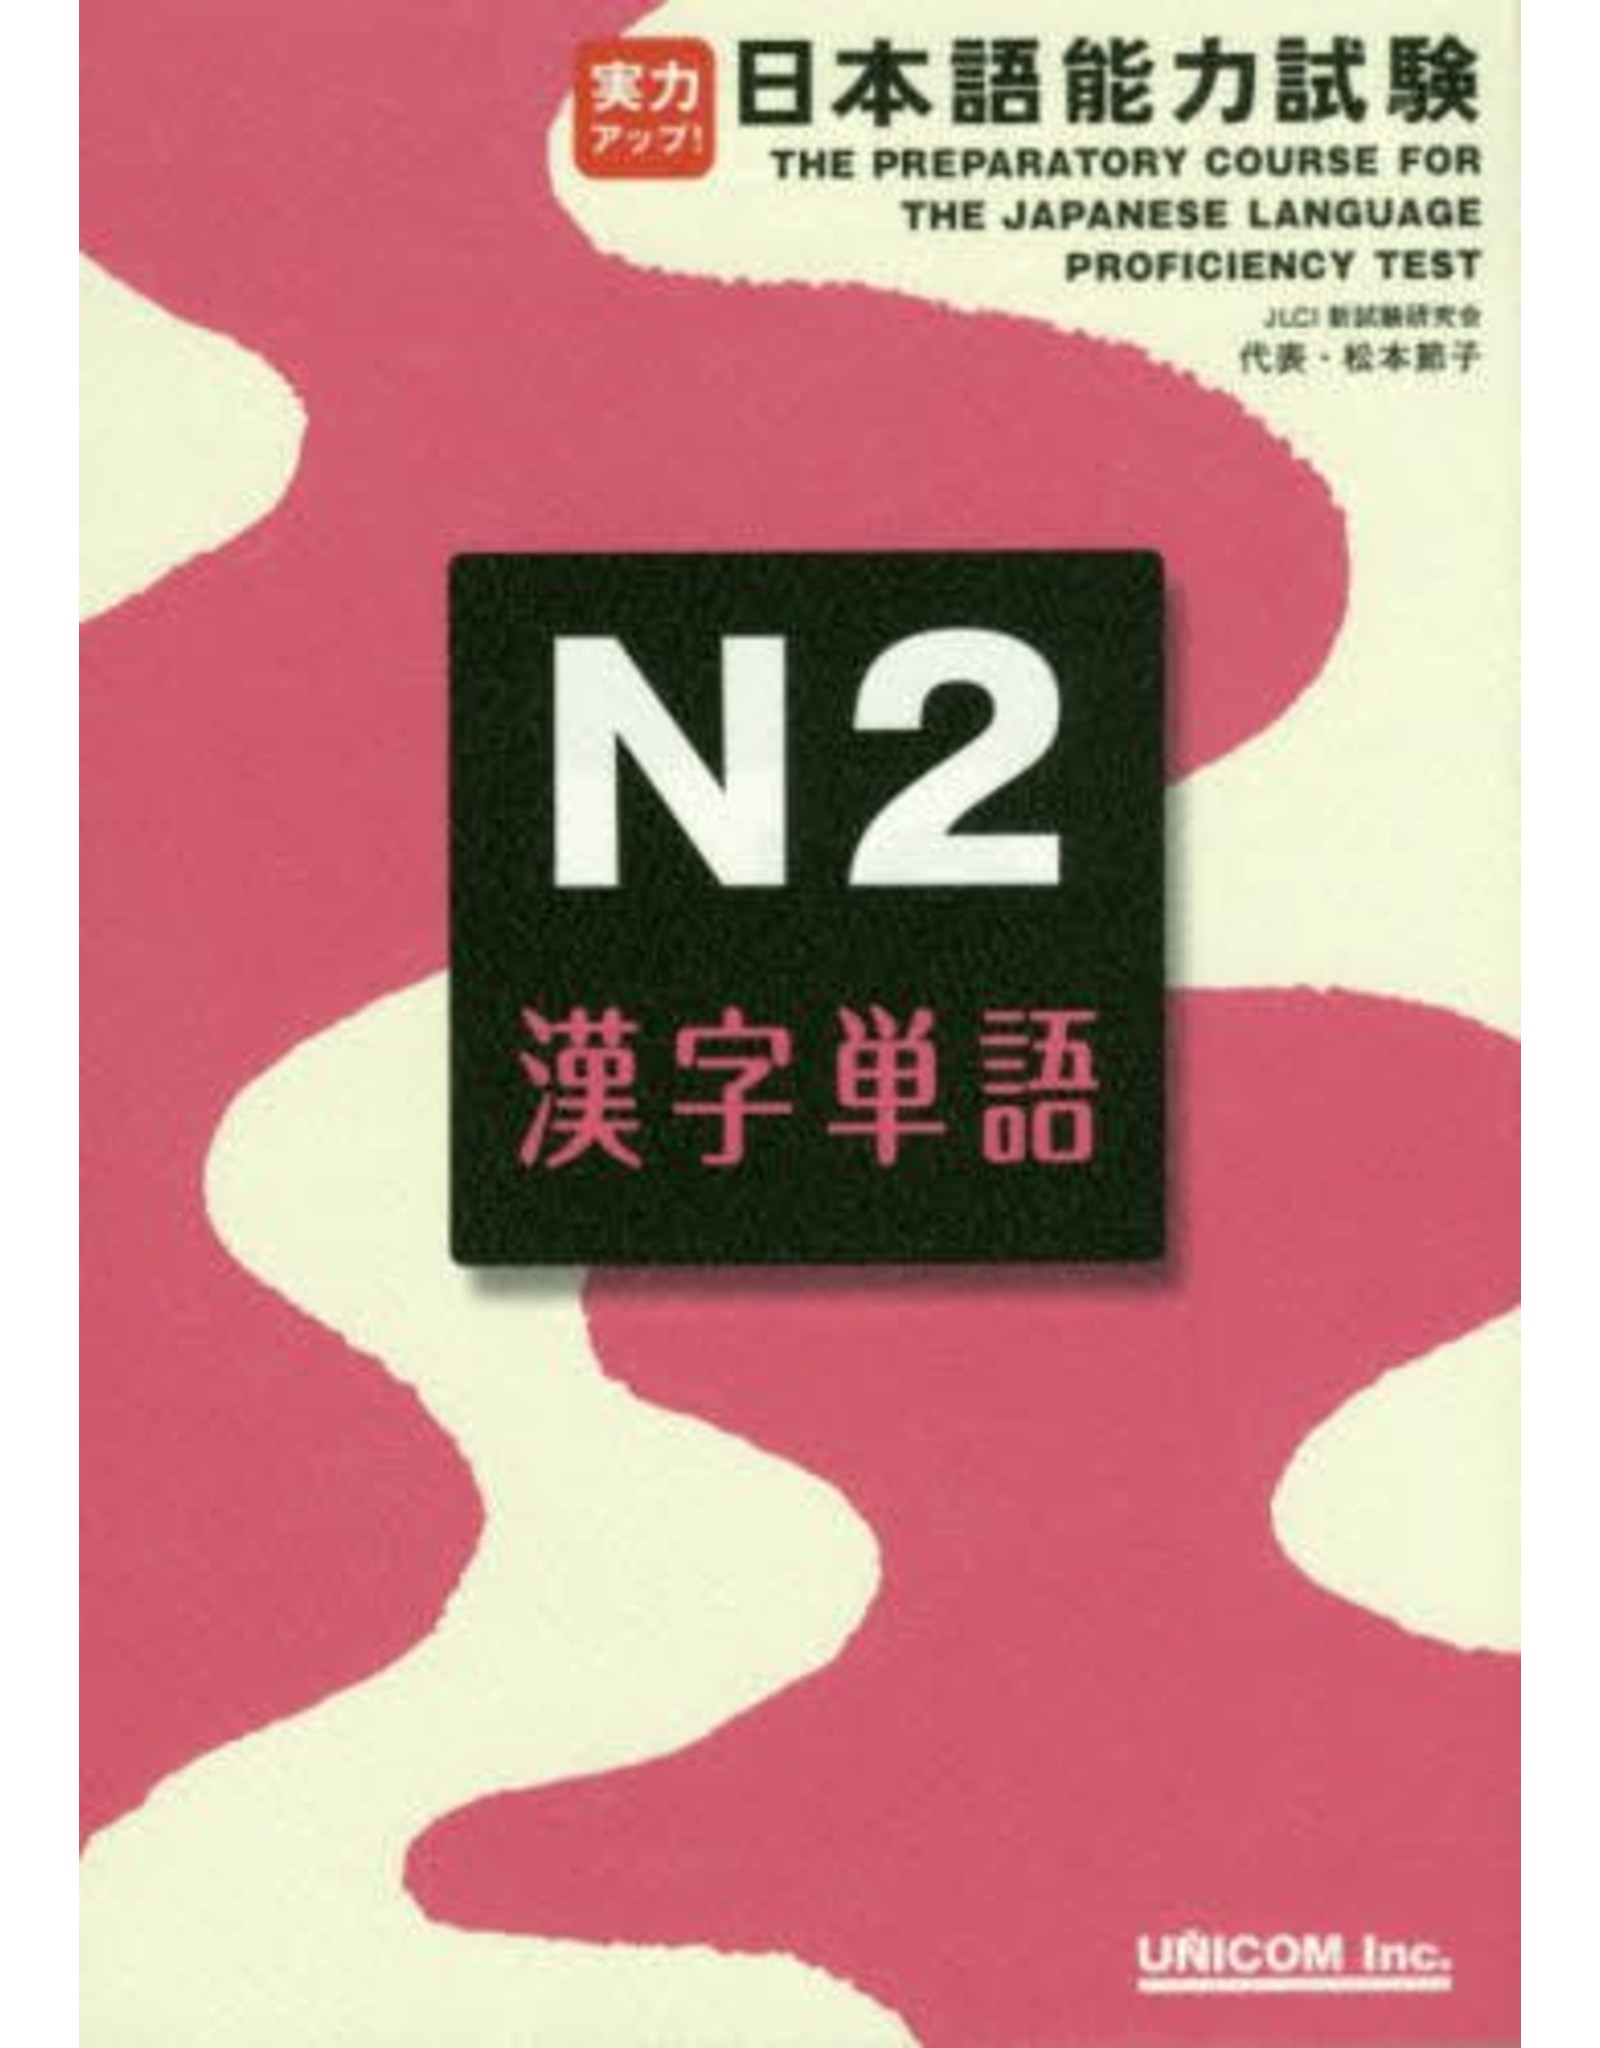 UNICOM THE PREPARATORY COURSE FOR THE JLPT N2 KANJI TANGO